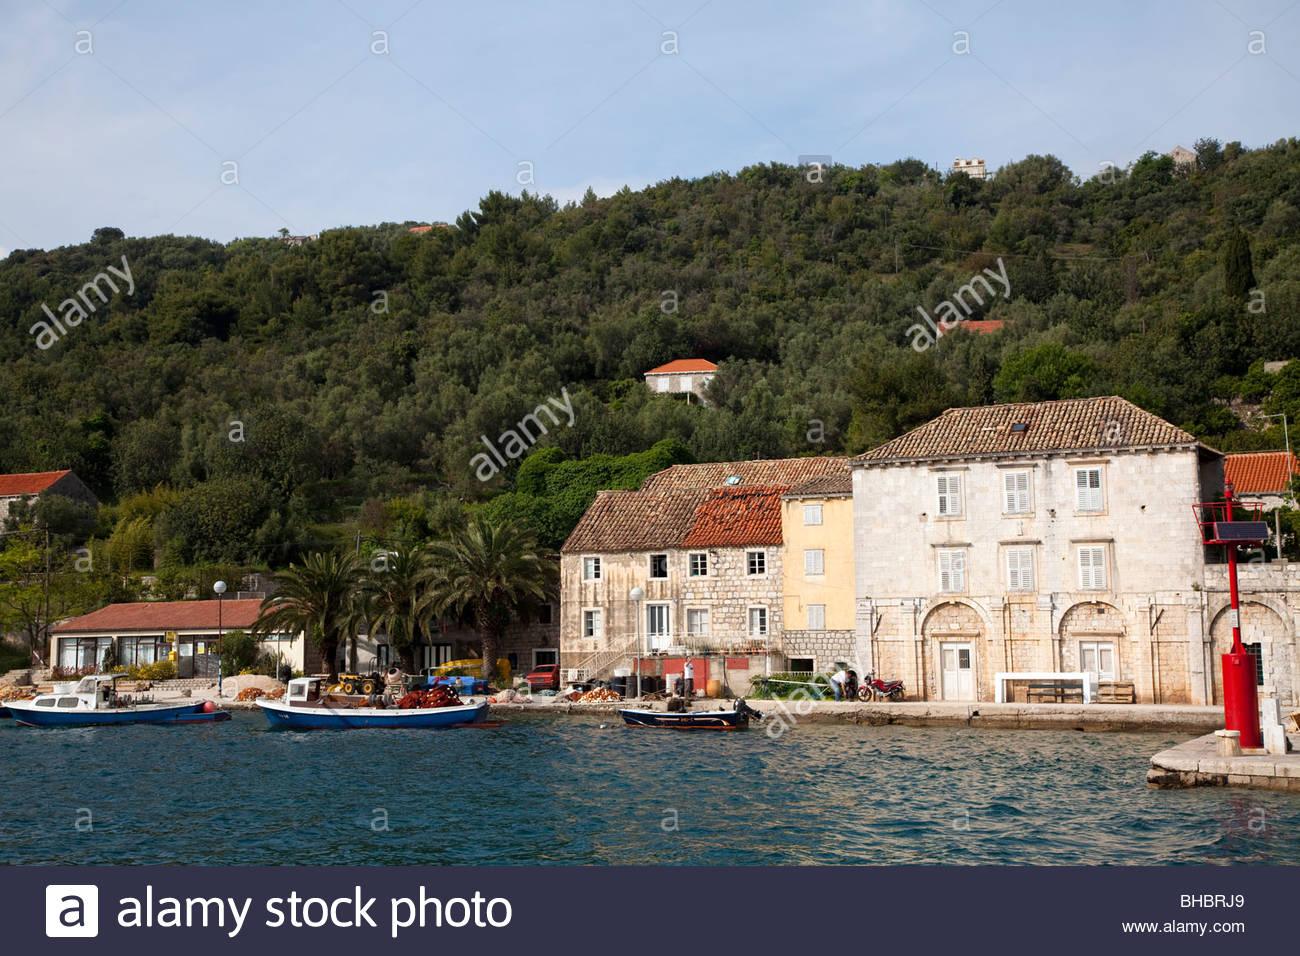 Adriatic Balkan boat boats Croatia Dalmatian Coast Europe European harbour human humans island Luka Sipanska Mediterranean - Stock Image